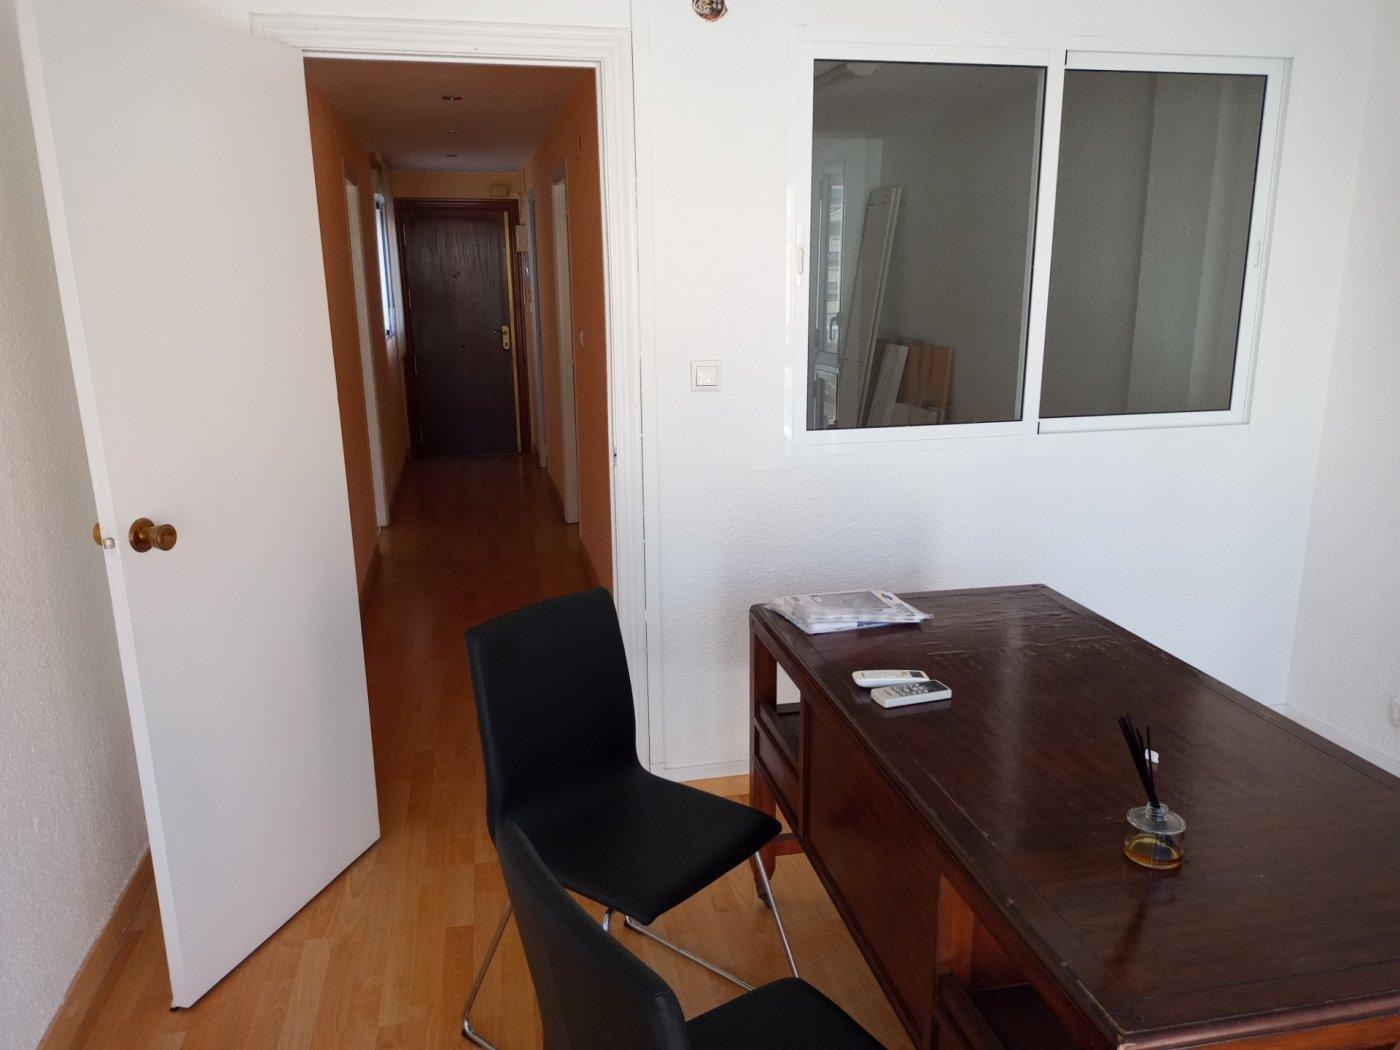 Oficina centrica en alquiler - imagenInmueble1